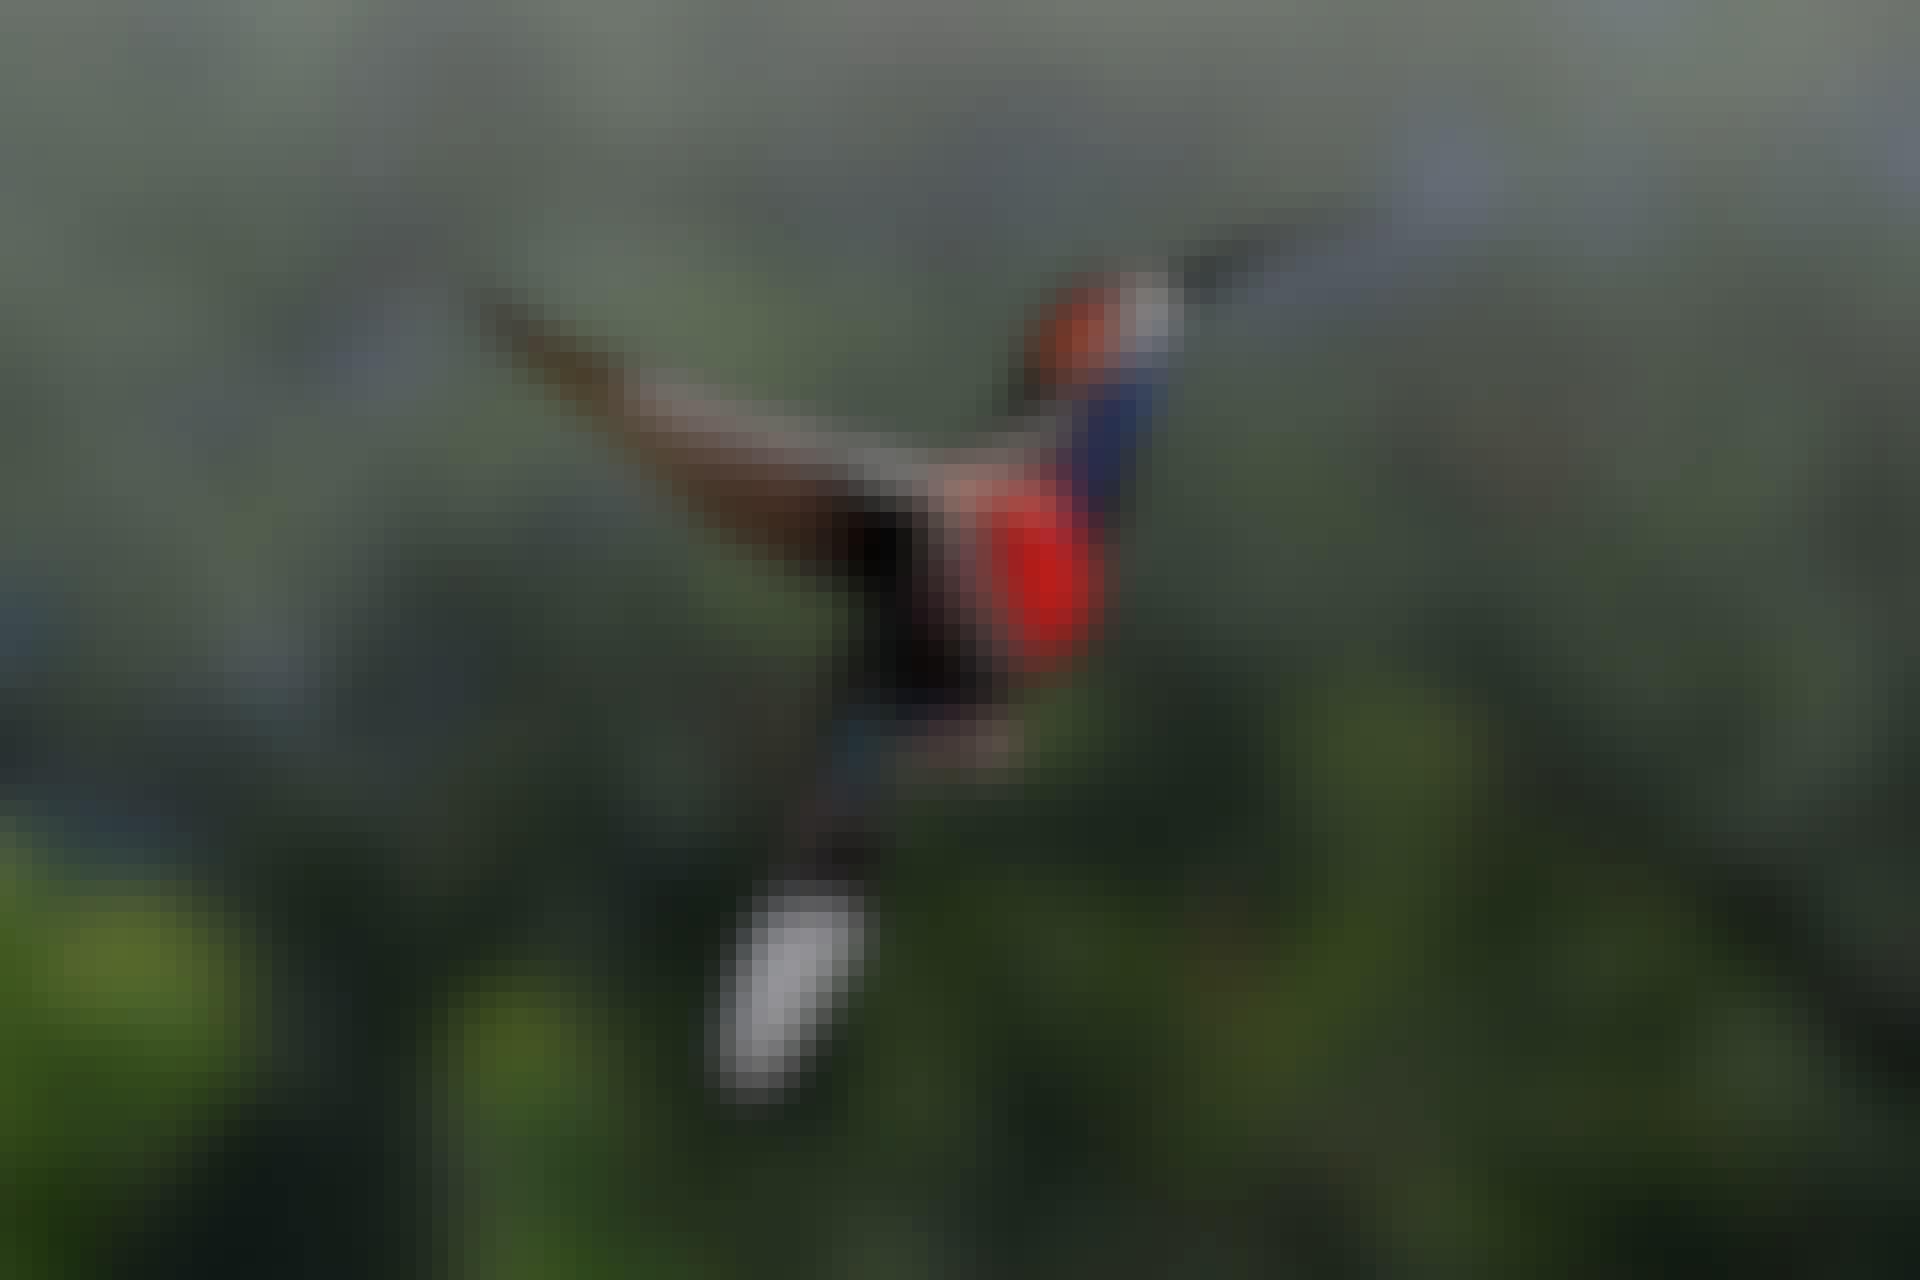 Kolibrins bröstmuskler